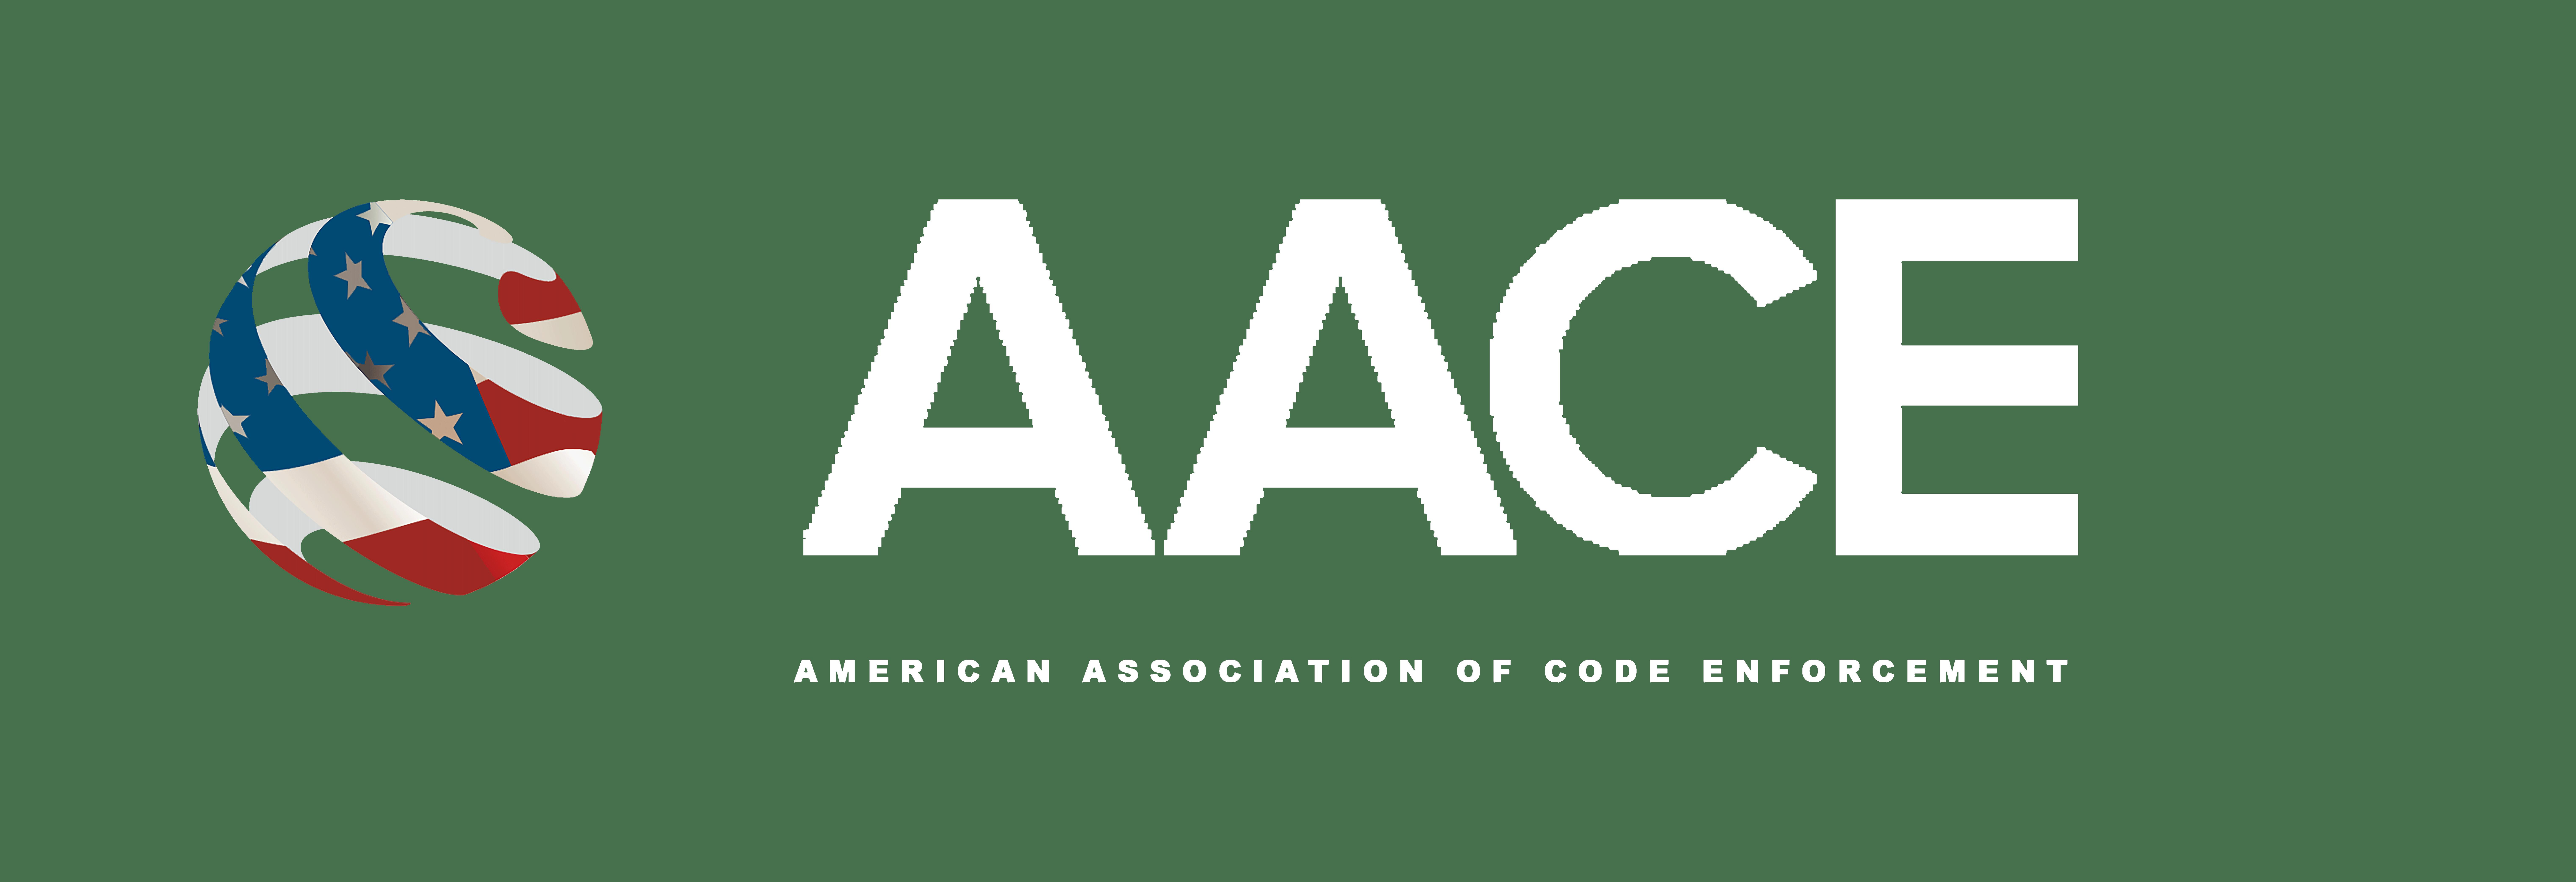 AMERICAN ASSOCIATION OF CODE ENFORCEMENT